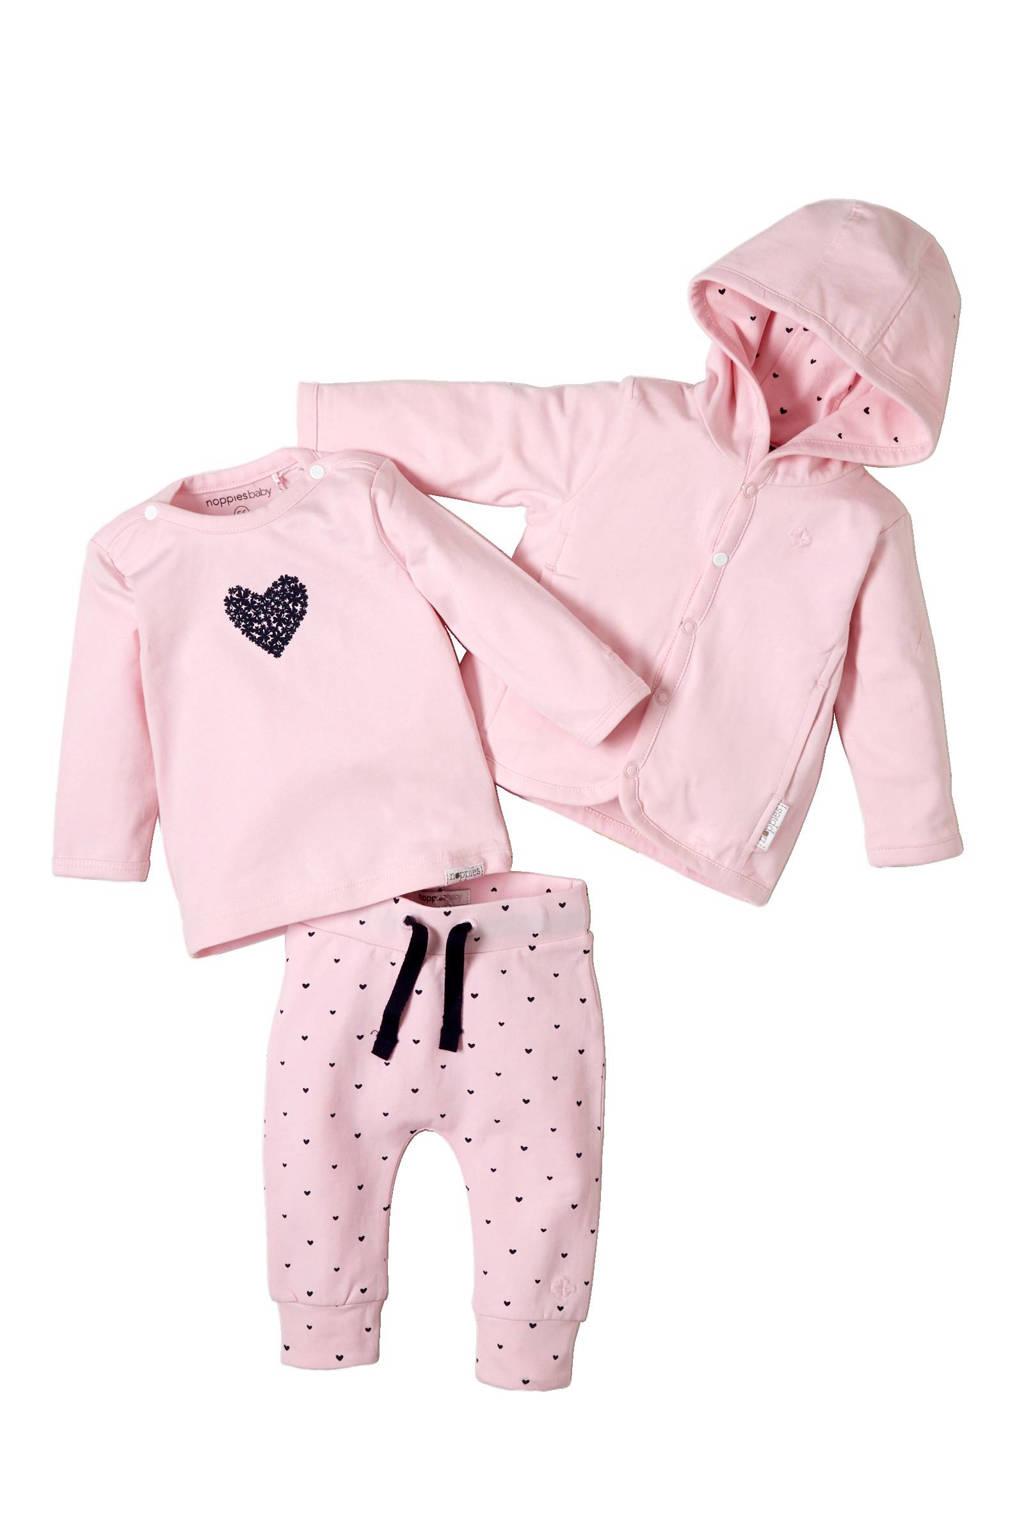 Noppies newborn baby legging Nynke, Lichtroze